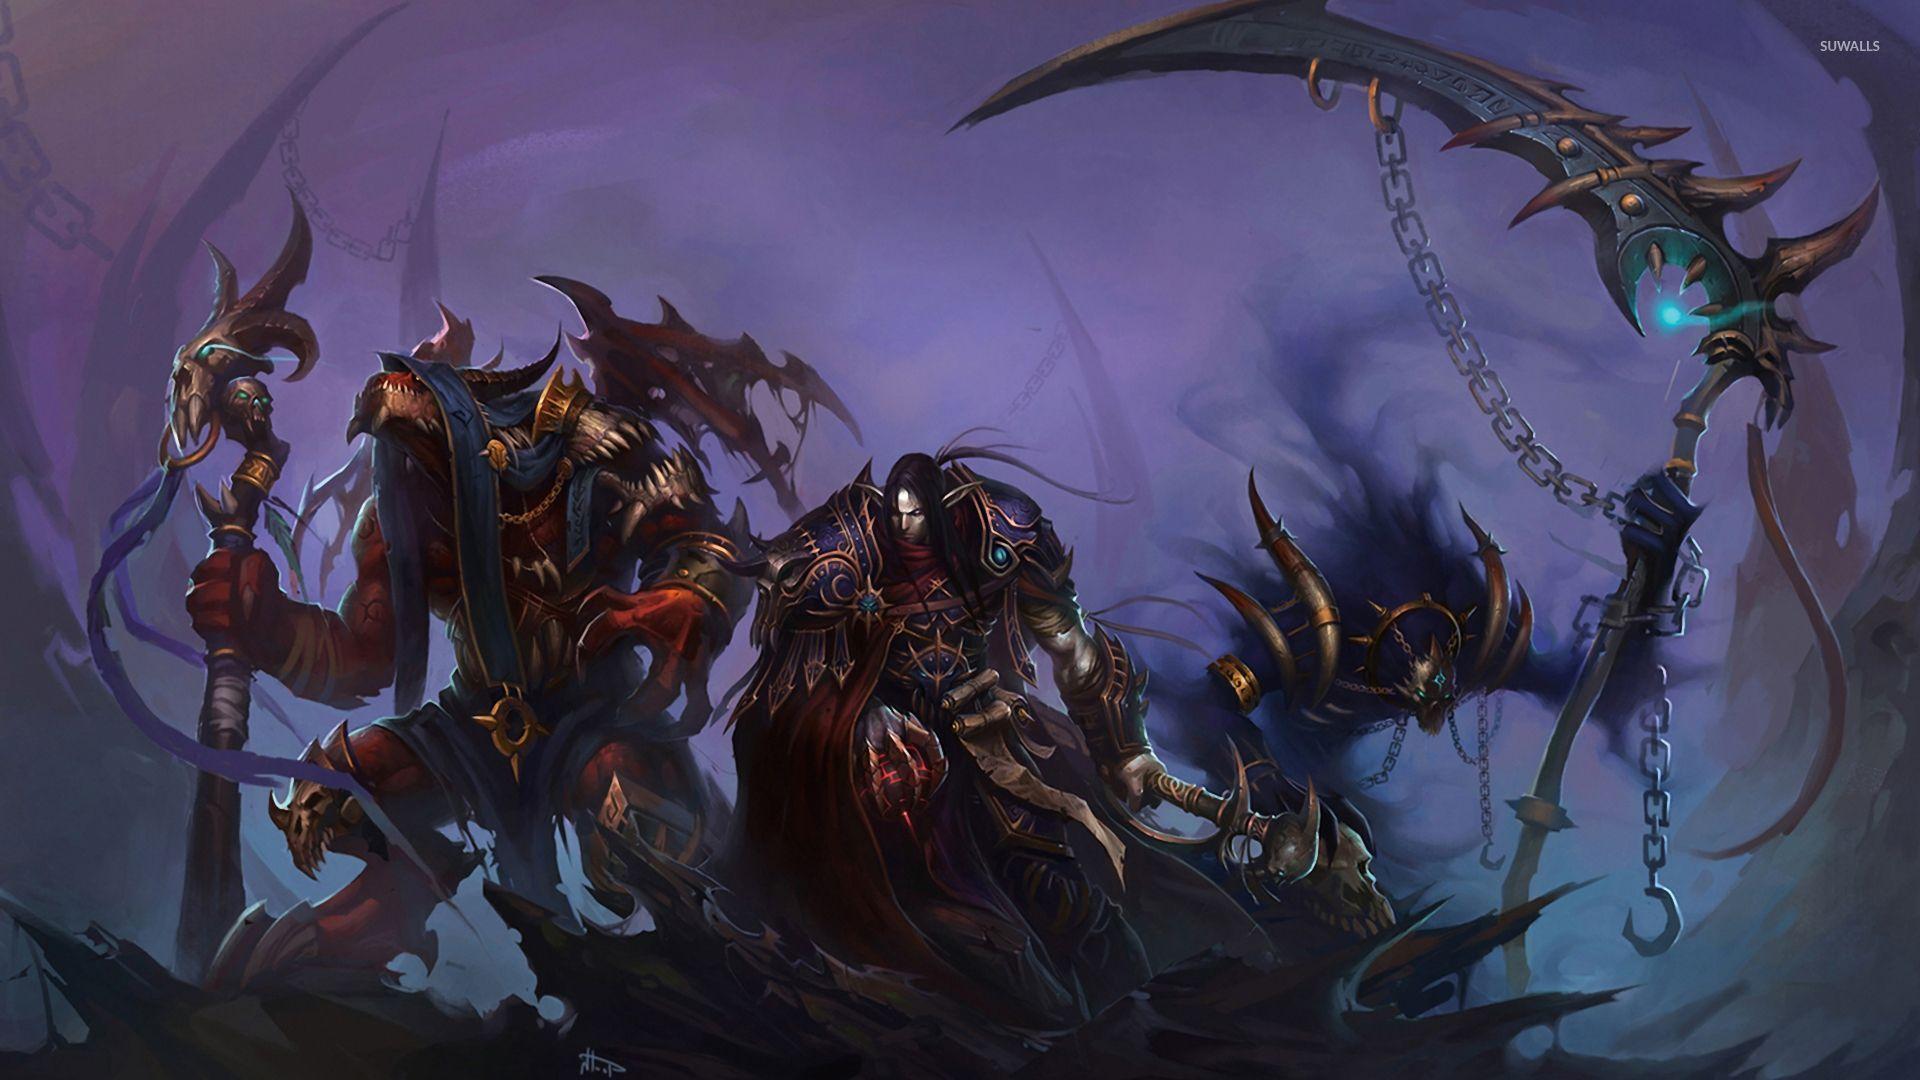 Free Download World Of Warcraft Warlock Wallpaper 1920x1080 For